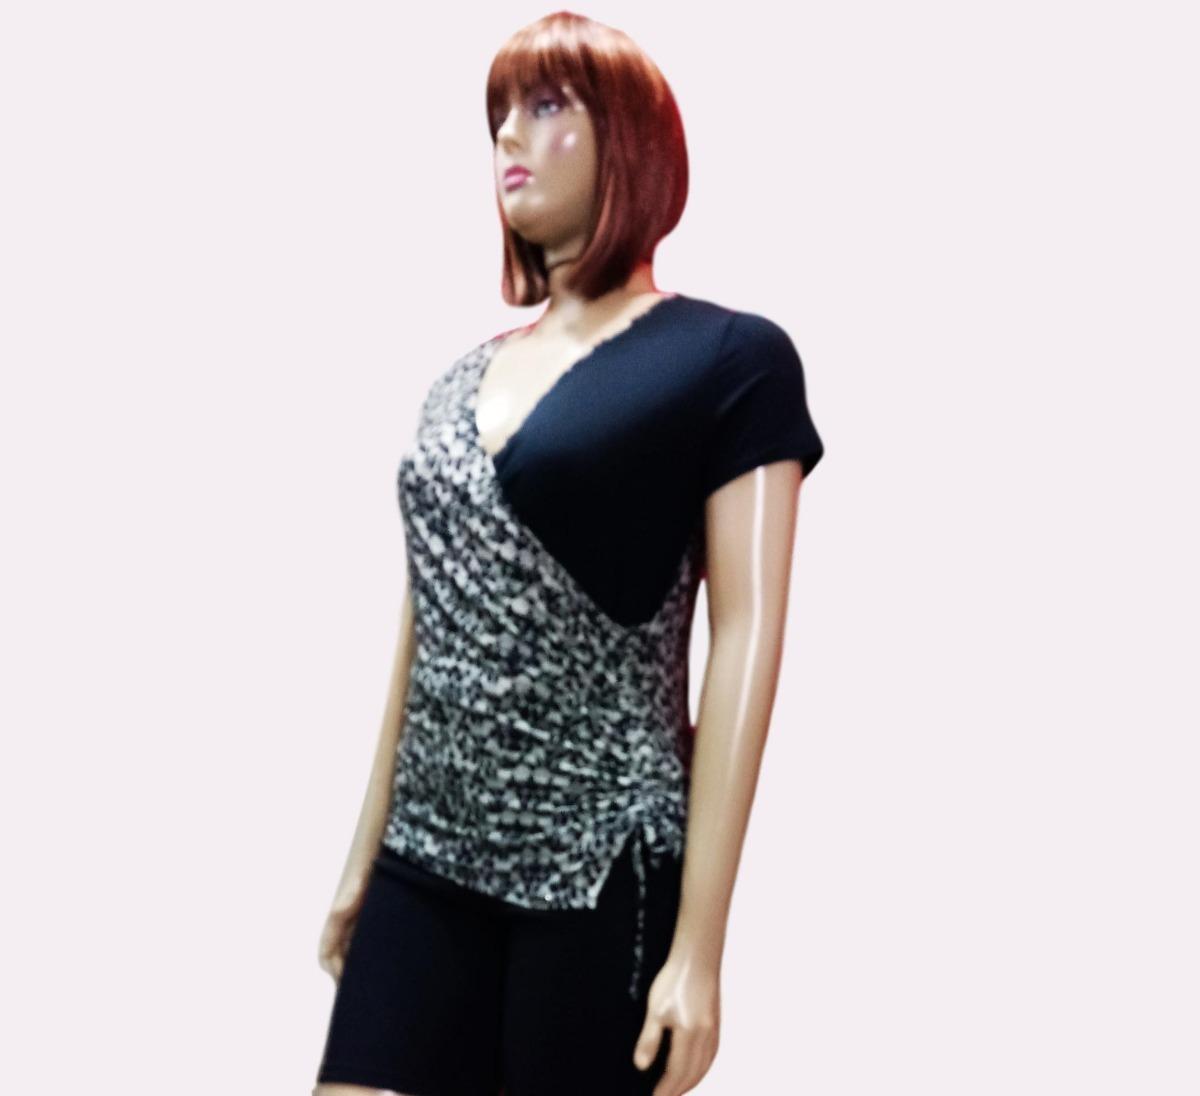 f4c31ef5b0 blusa feminina plus size malha fria social festa - 231. Carregando zoom.